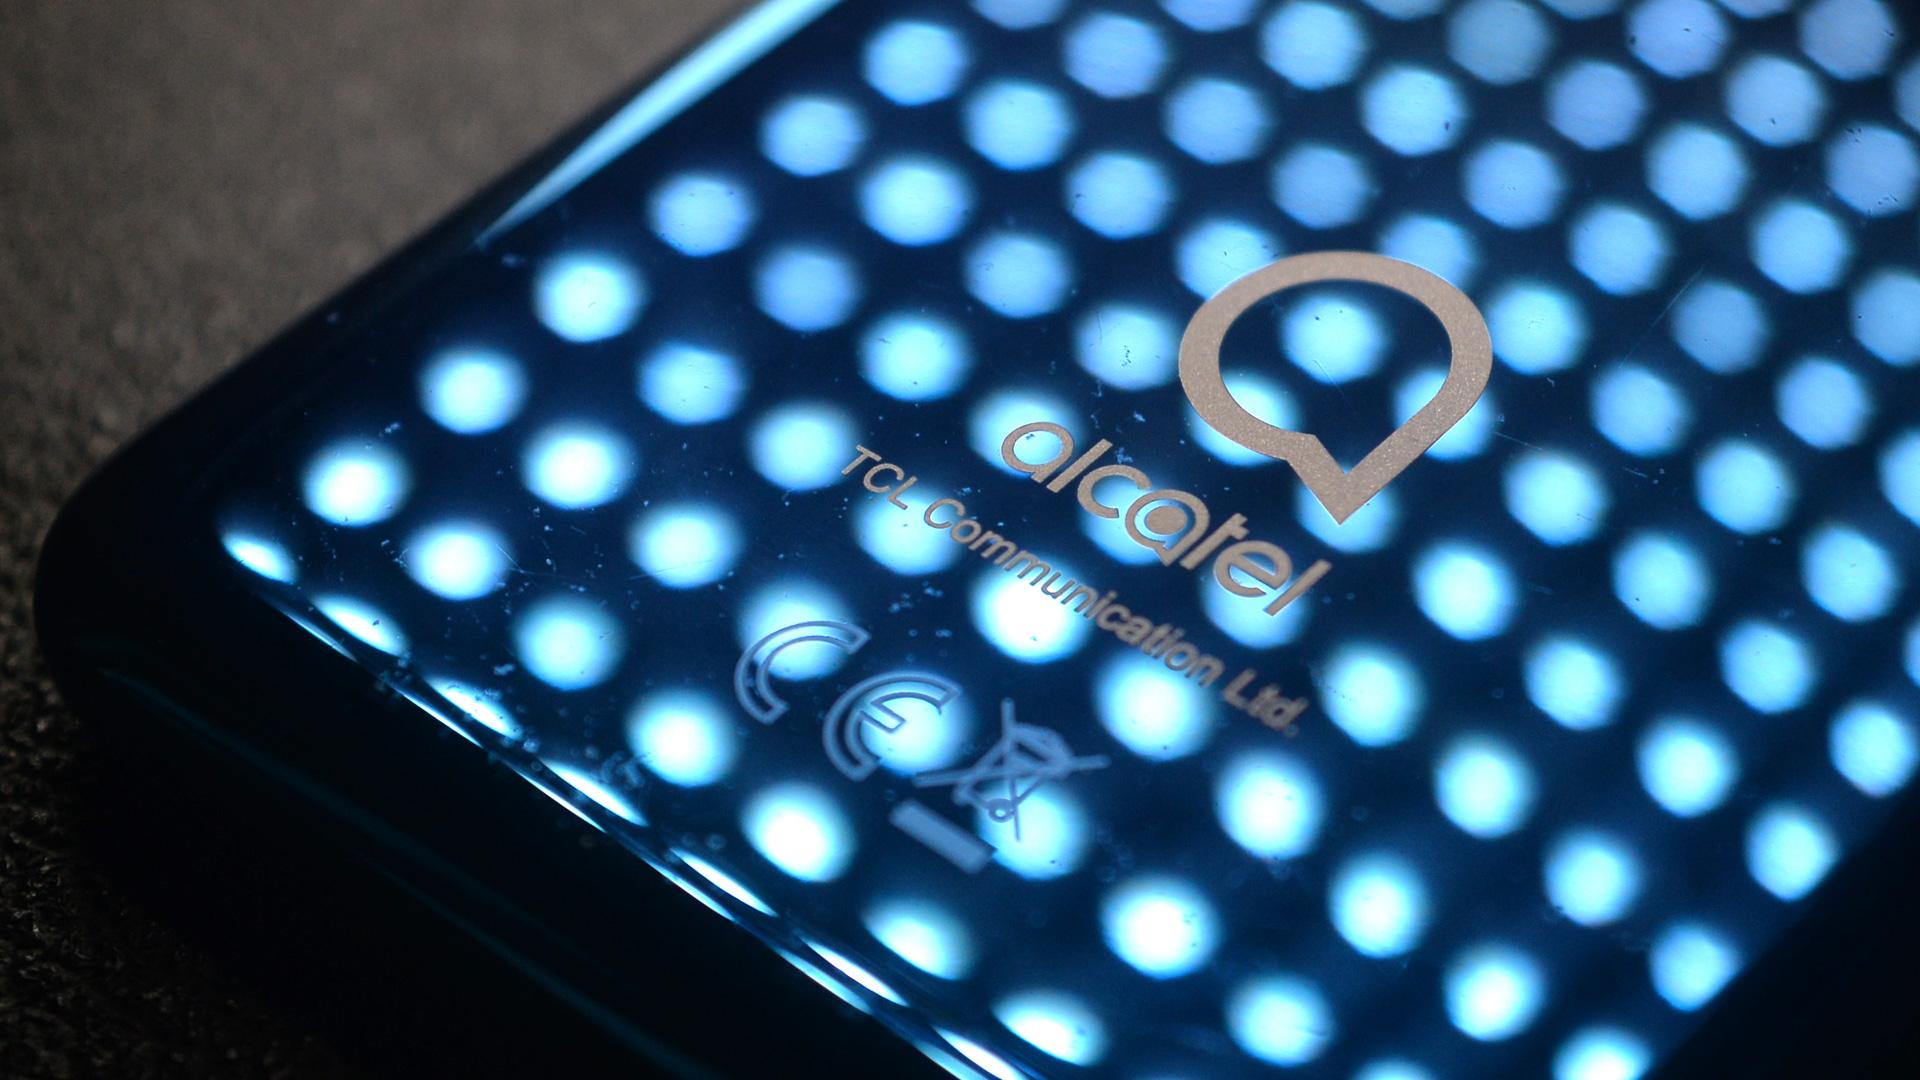 Waarom de Alcatel 3 zo'n goedkope smartphone is